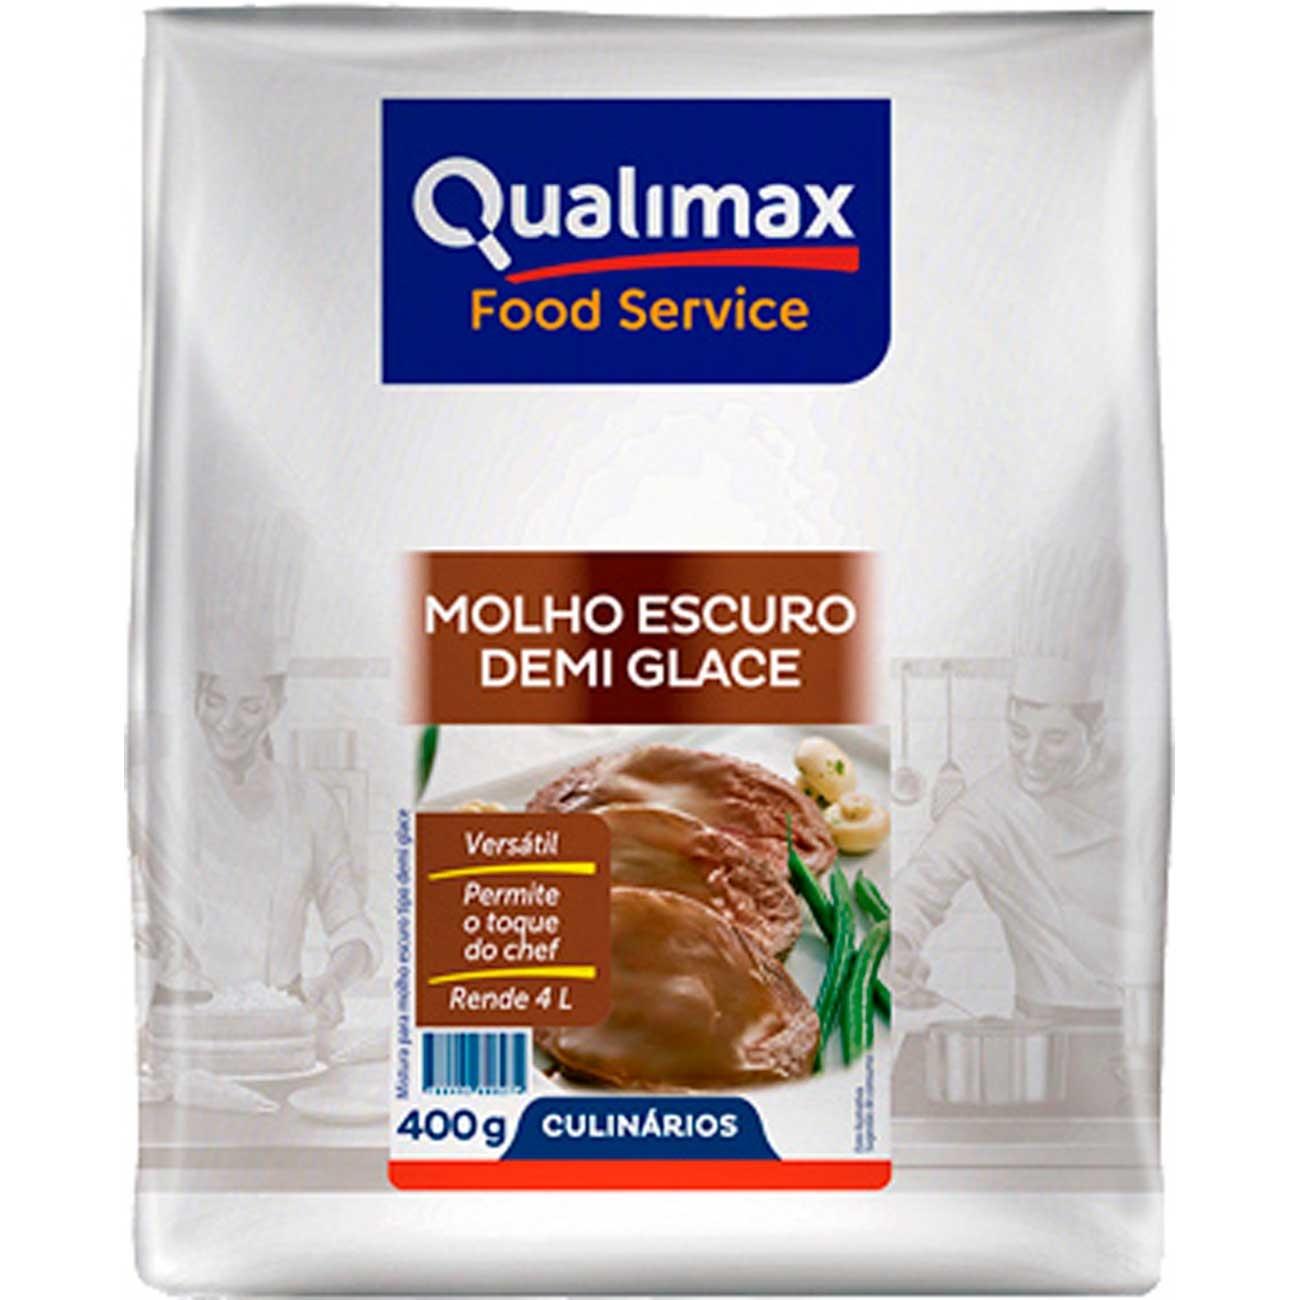 MOLHO ESCURO DEMI GLACE QUALIMAX 400 G